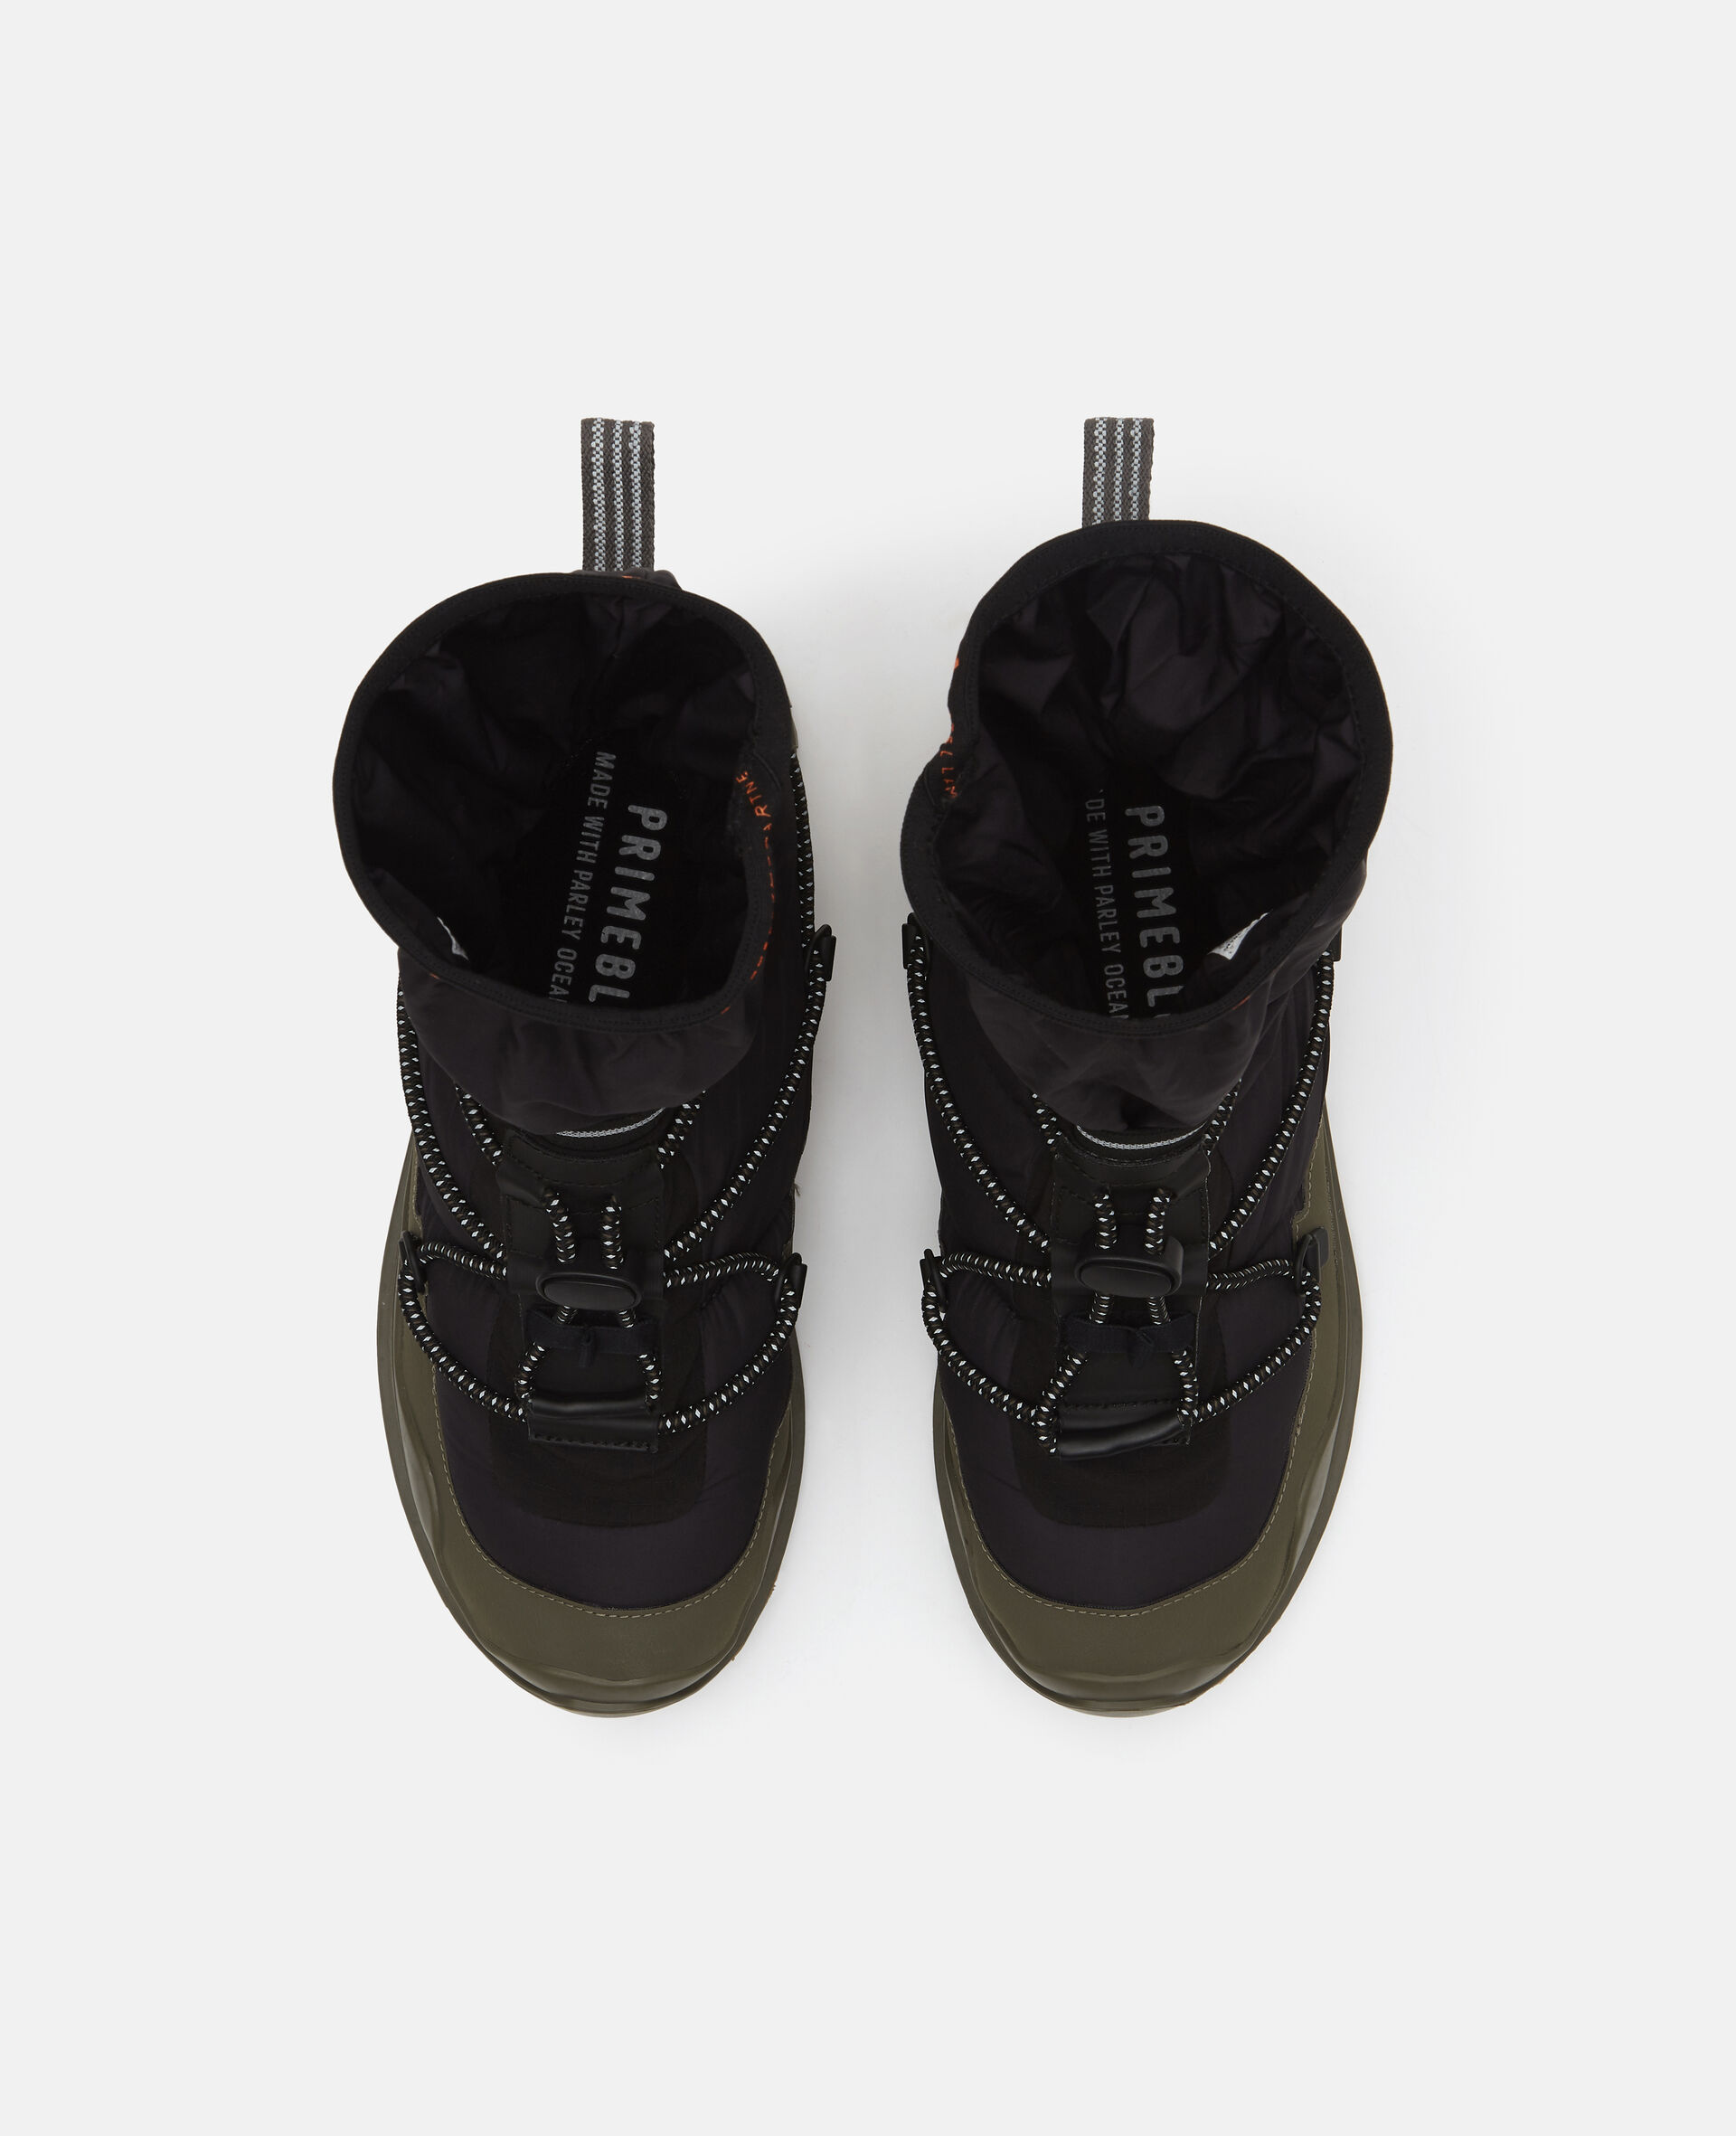 Winter Boots-Black-large image number 5